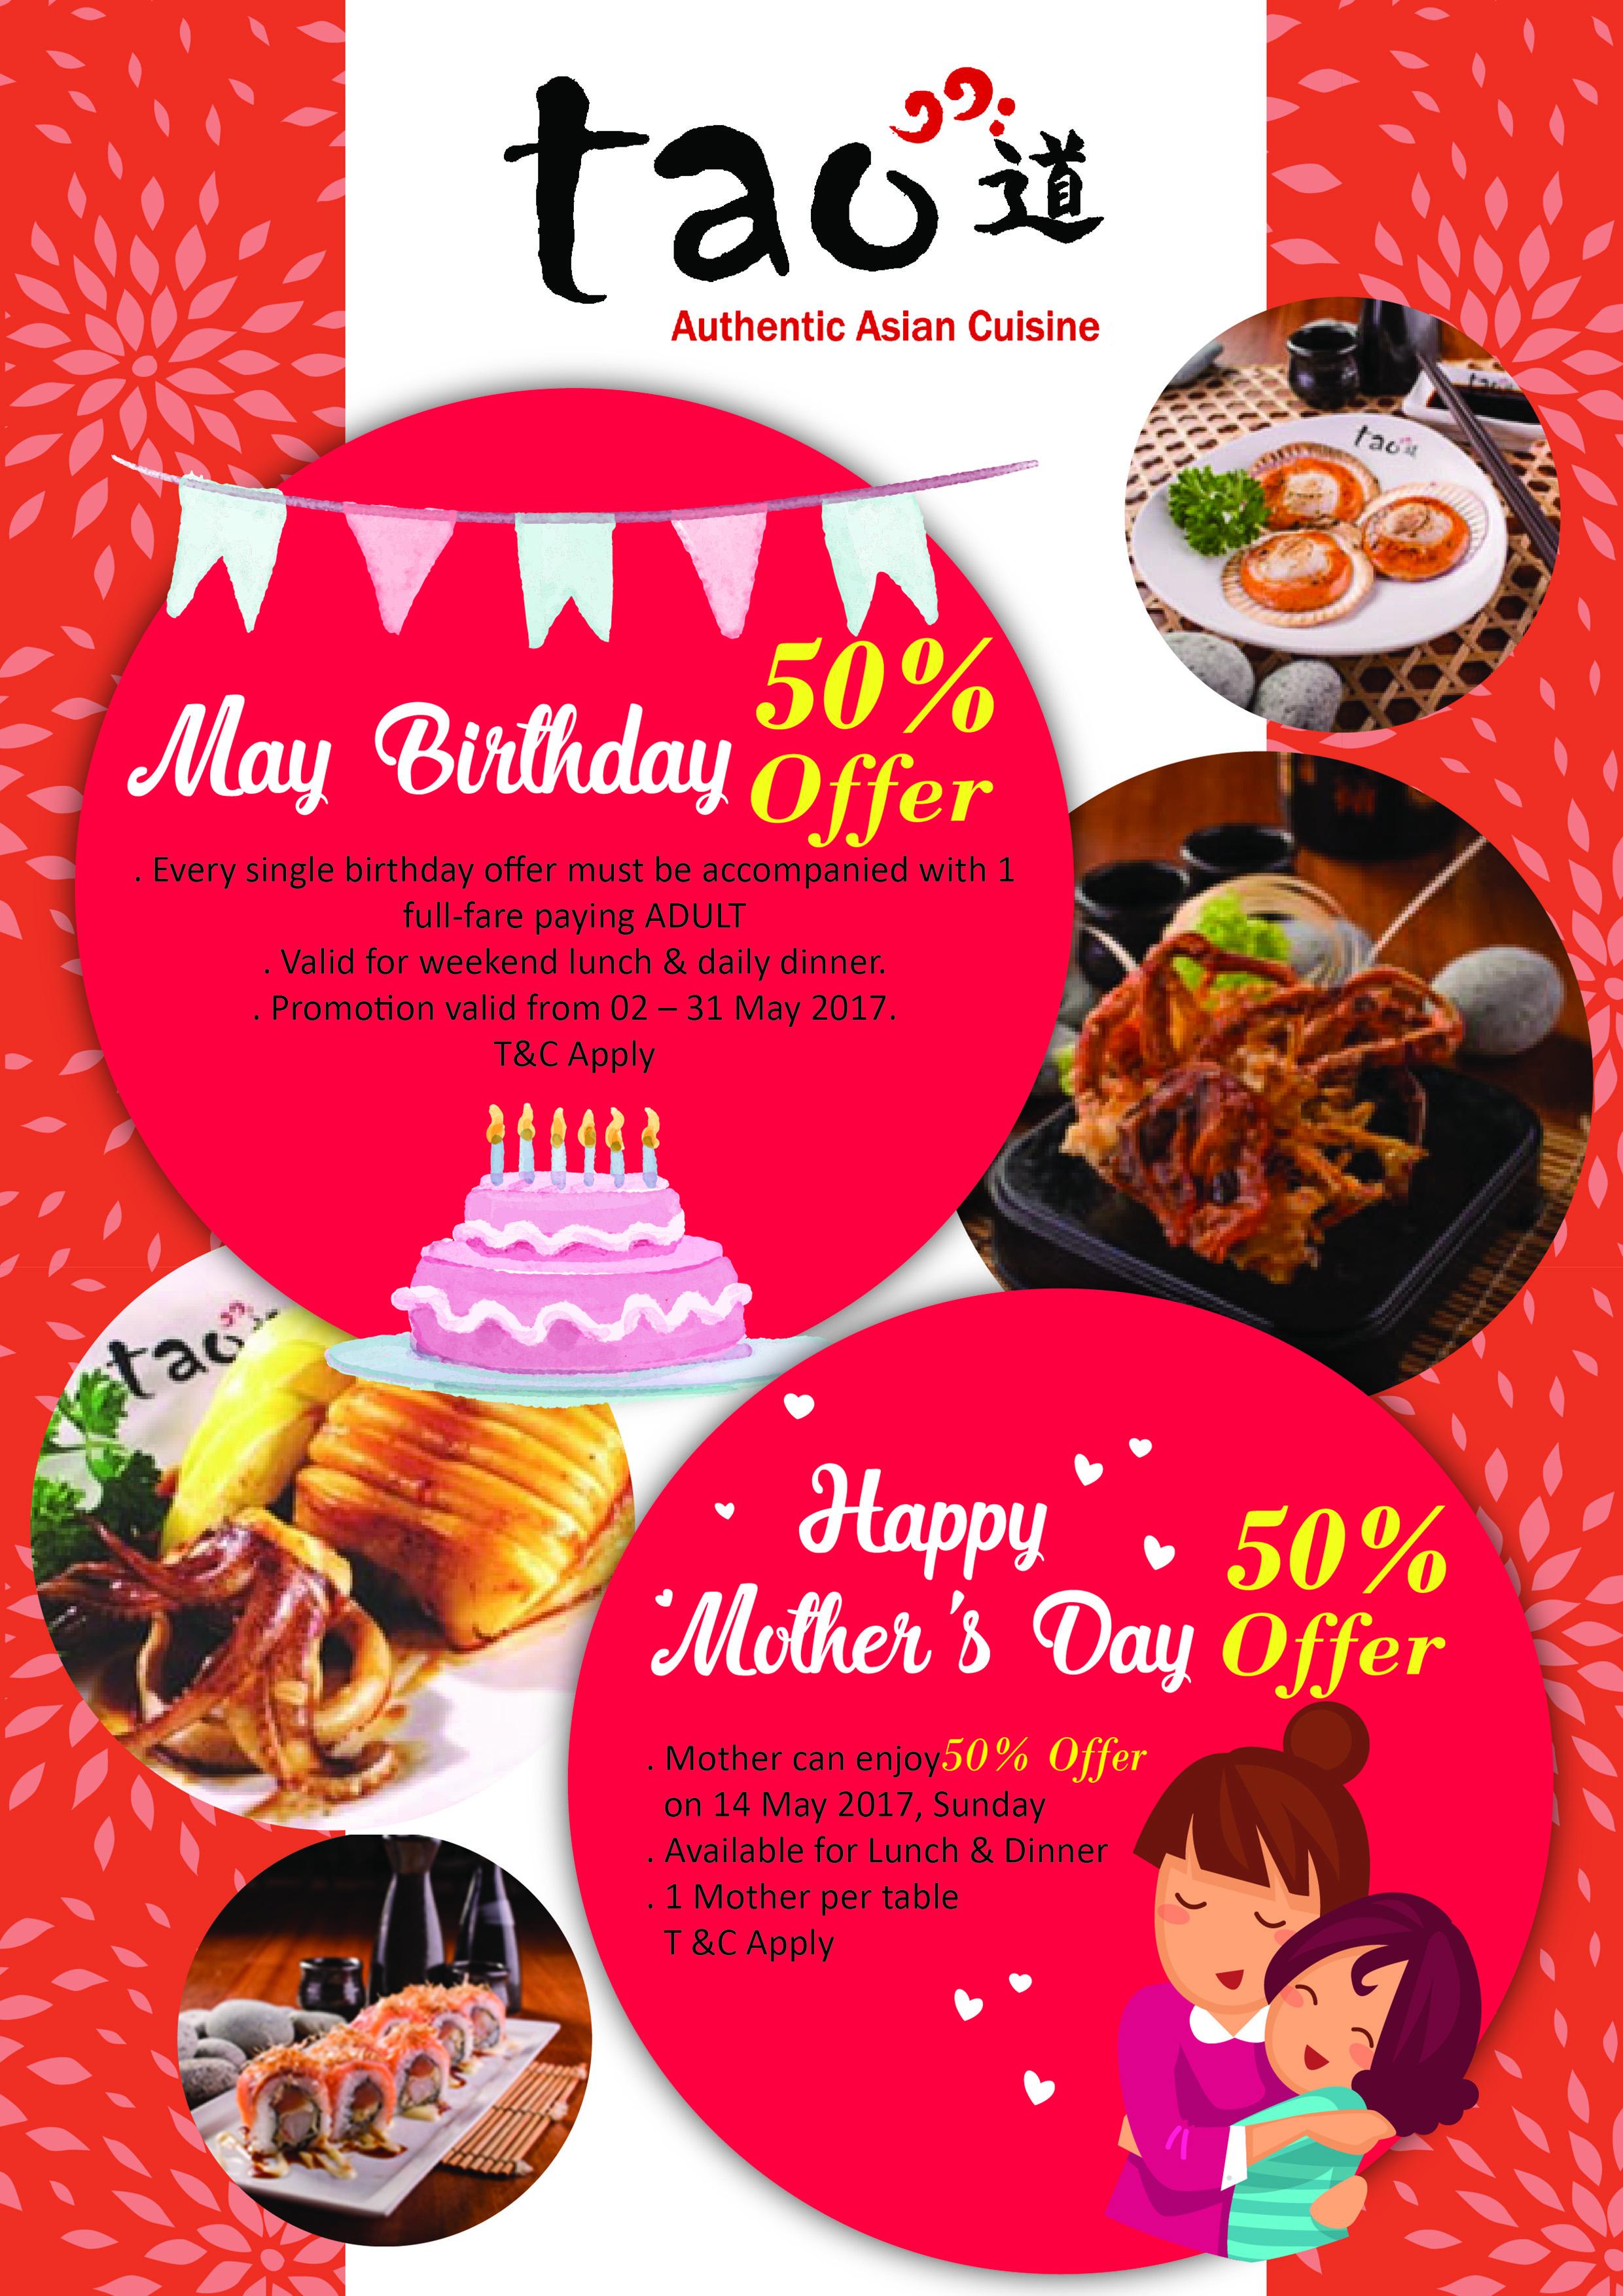 tao-cuisine - news & promo